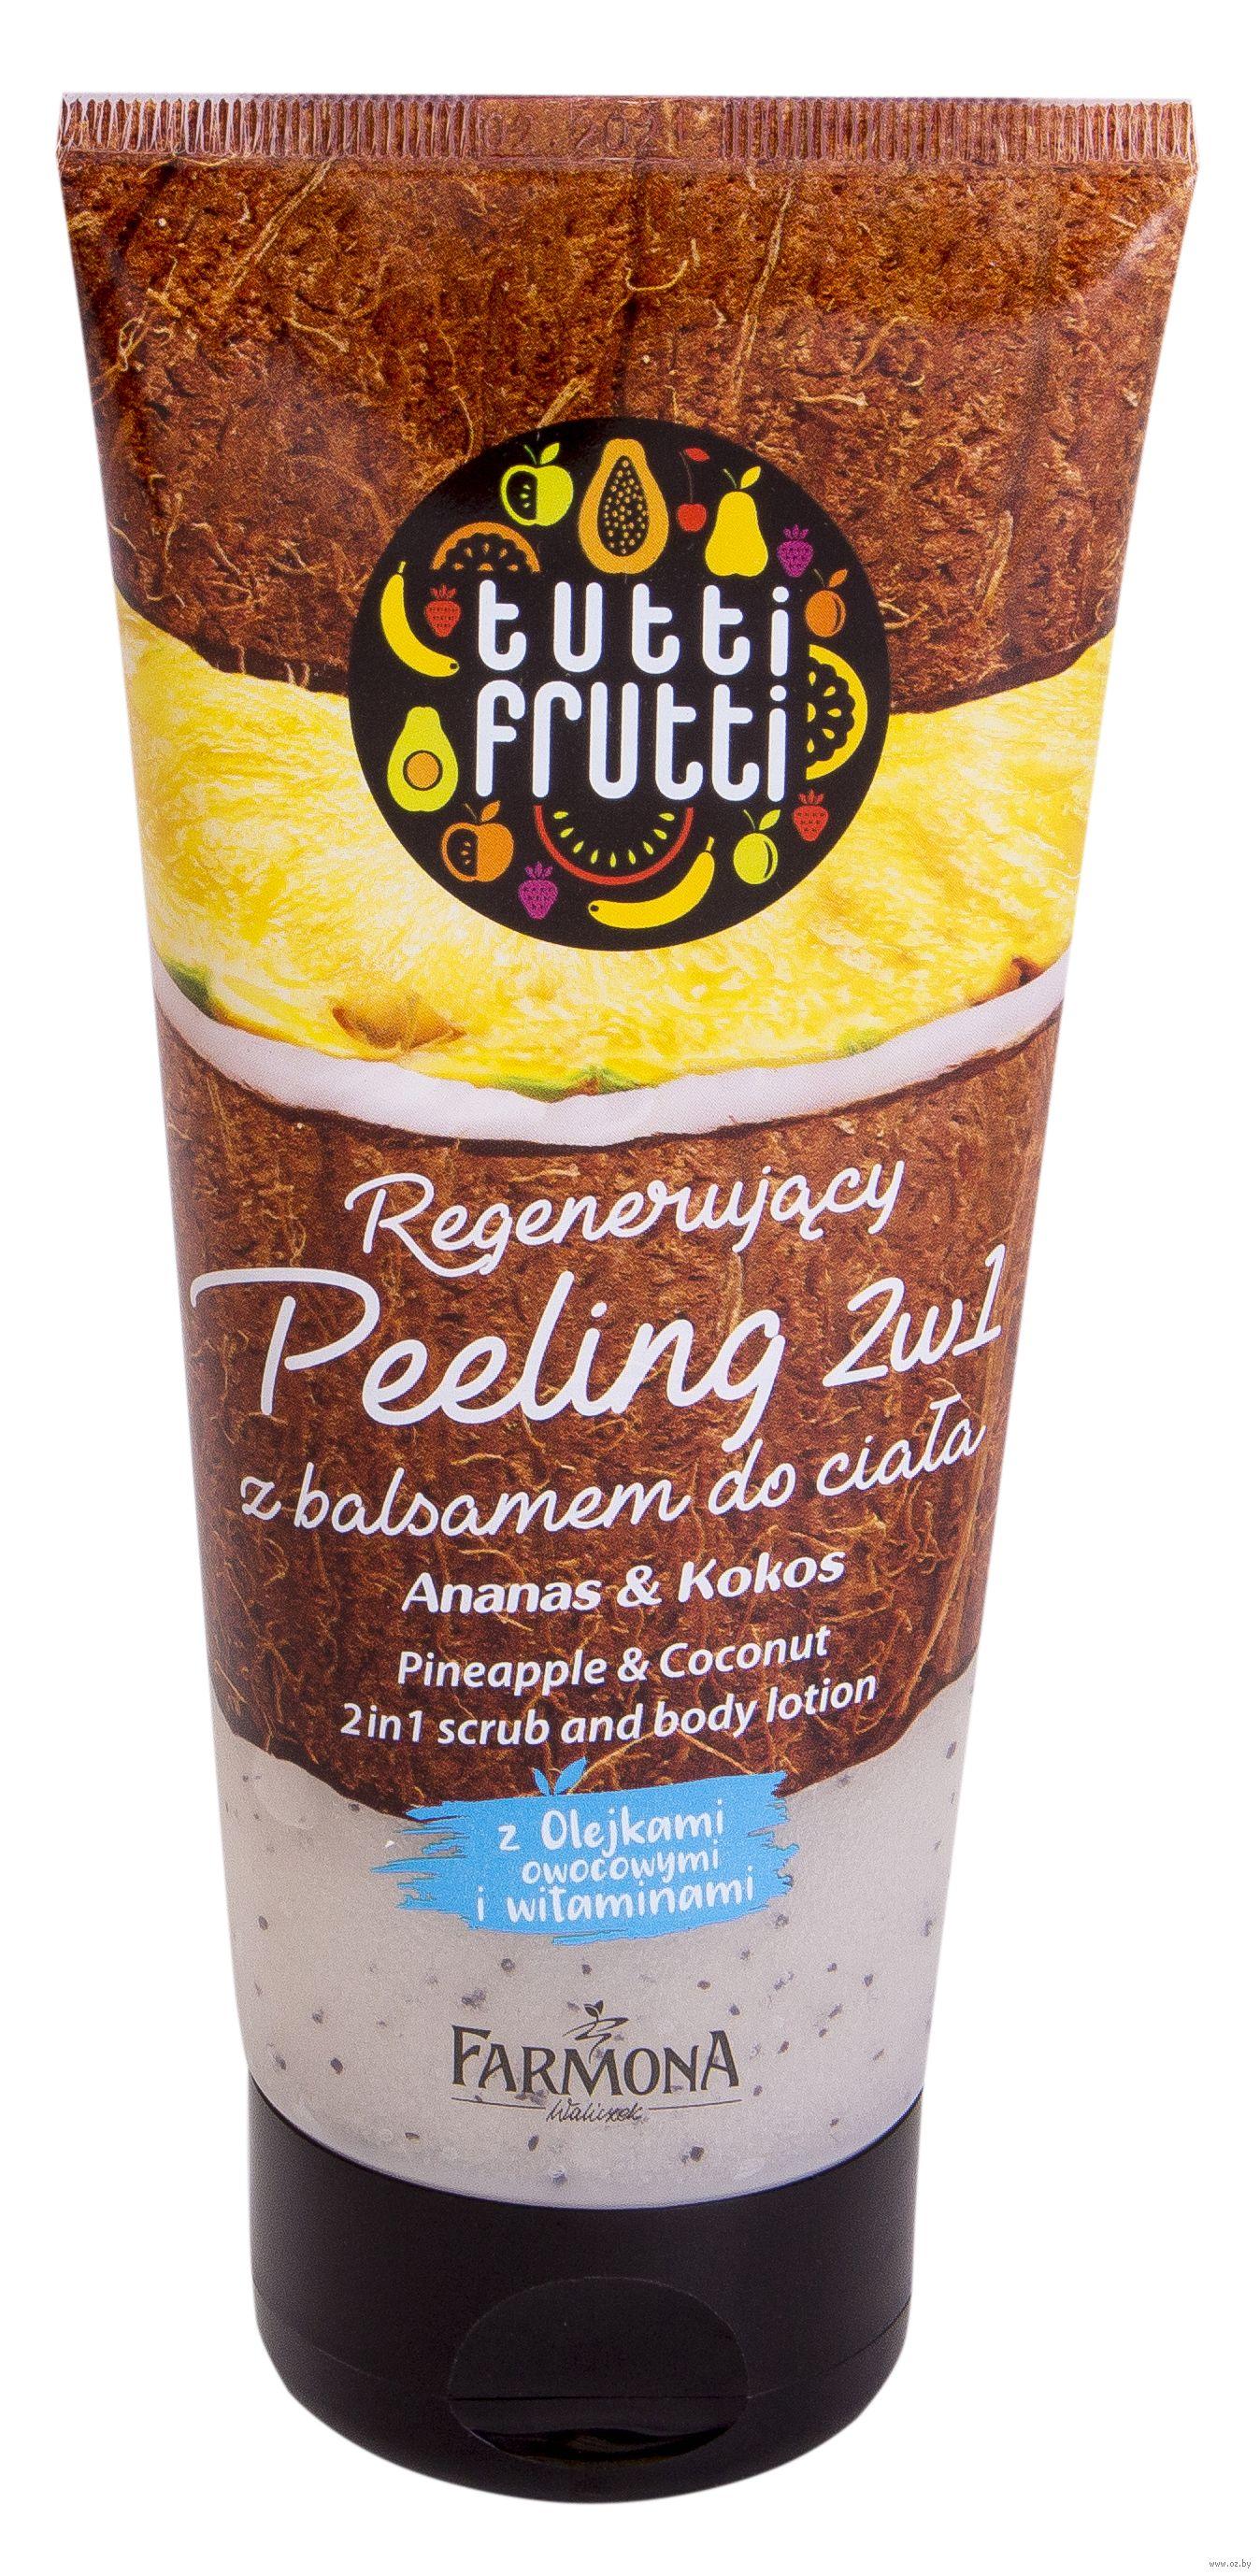 Tutti Frutti Ананас и Кокос 2 в 1 Cкраб и лосьон для тела для душа